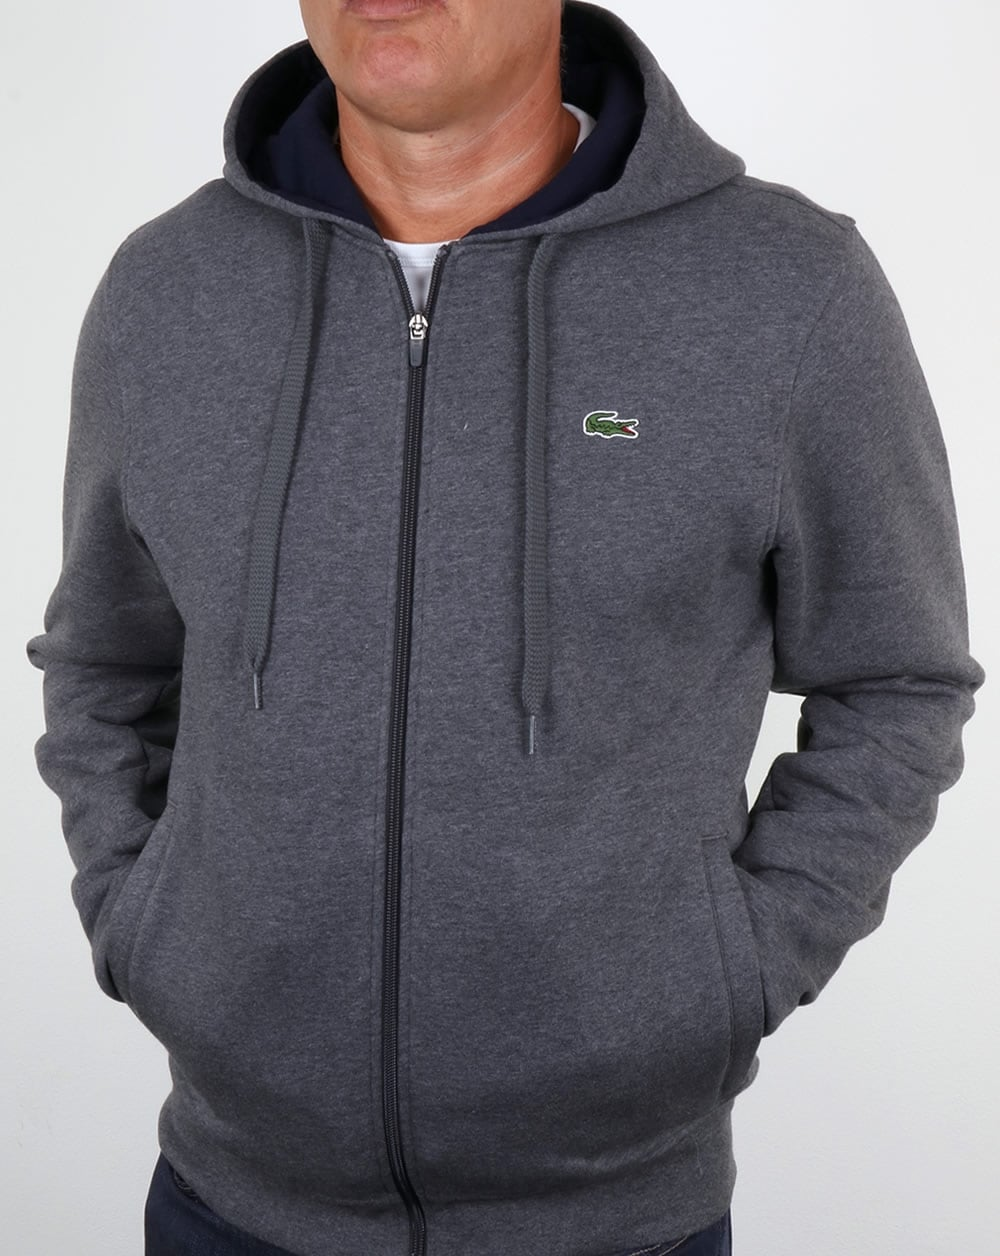 df70d2880054f0 Lacoste Hooded Full Zip Sweatshirt Pitch Navy